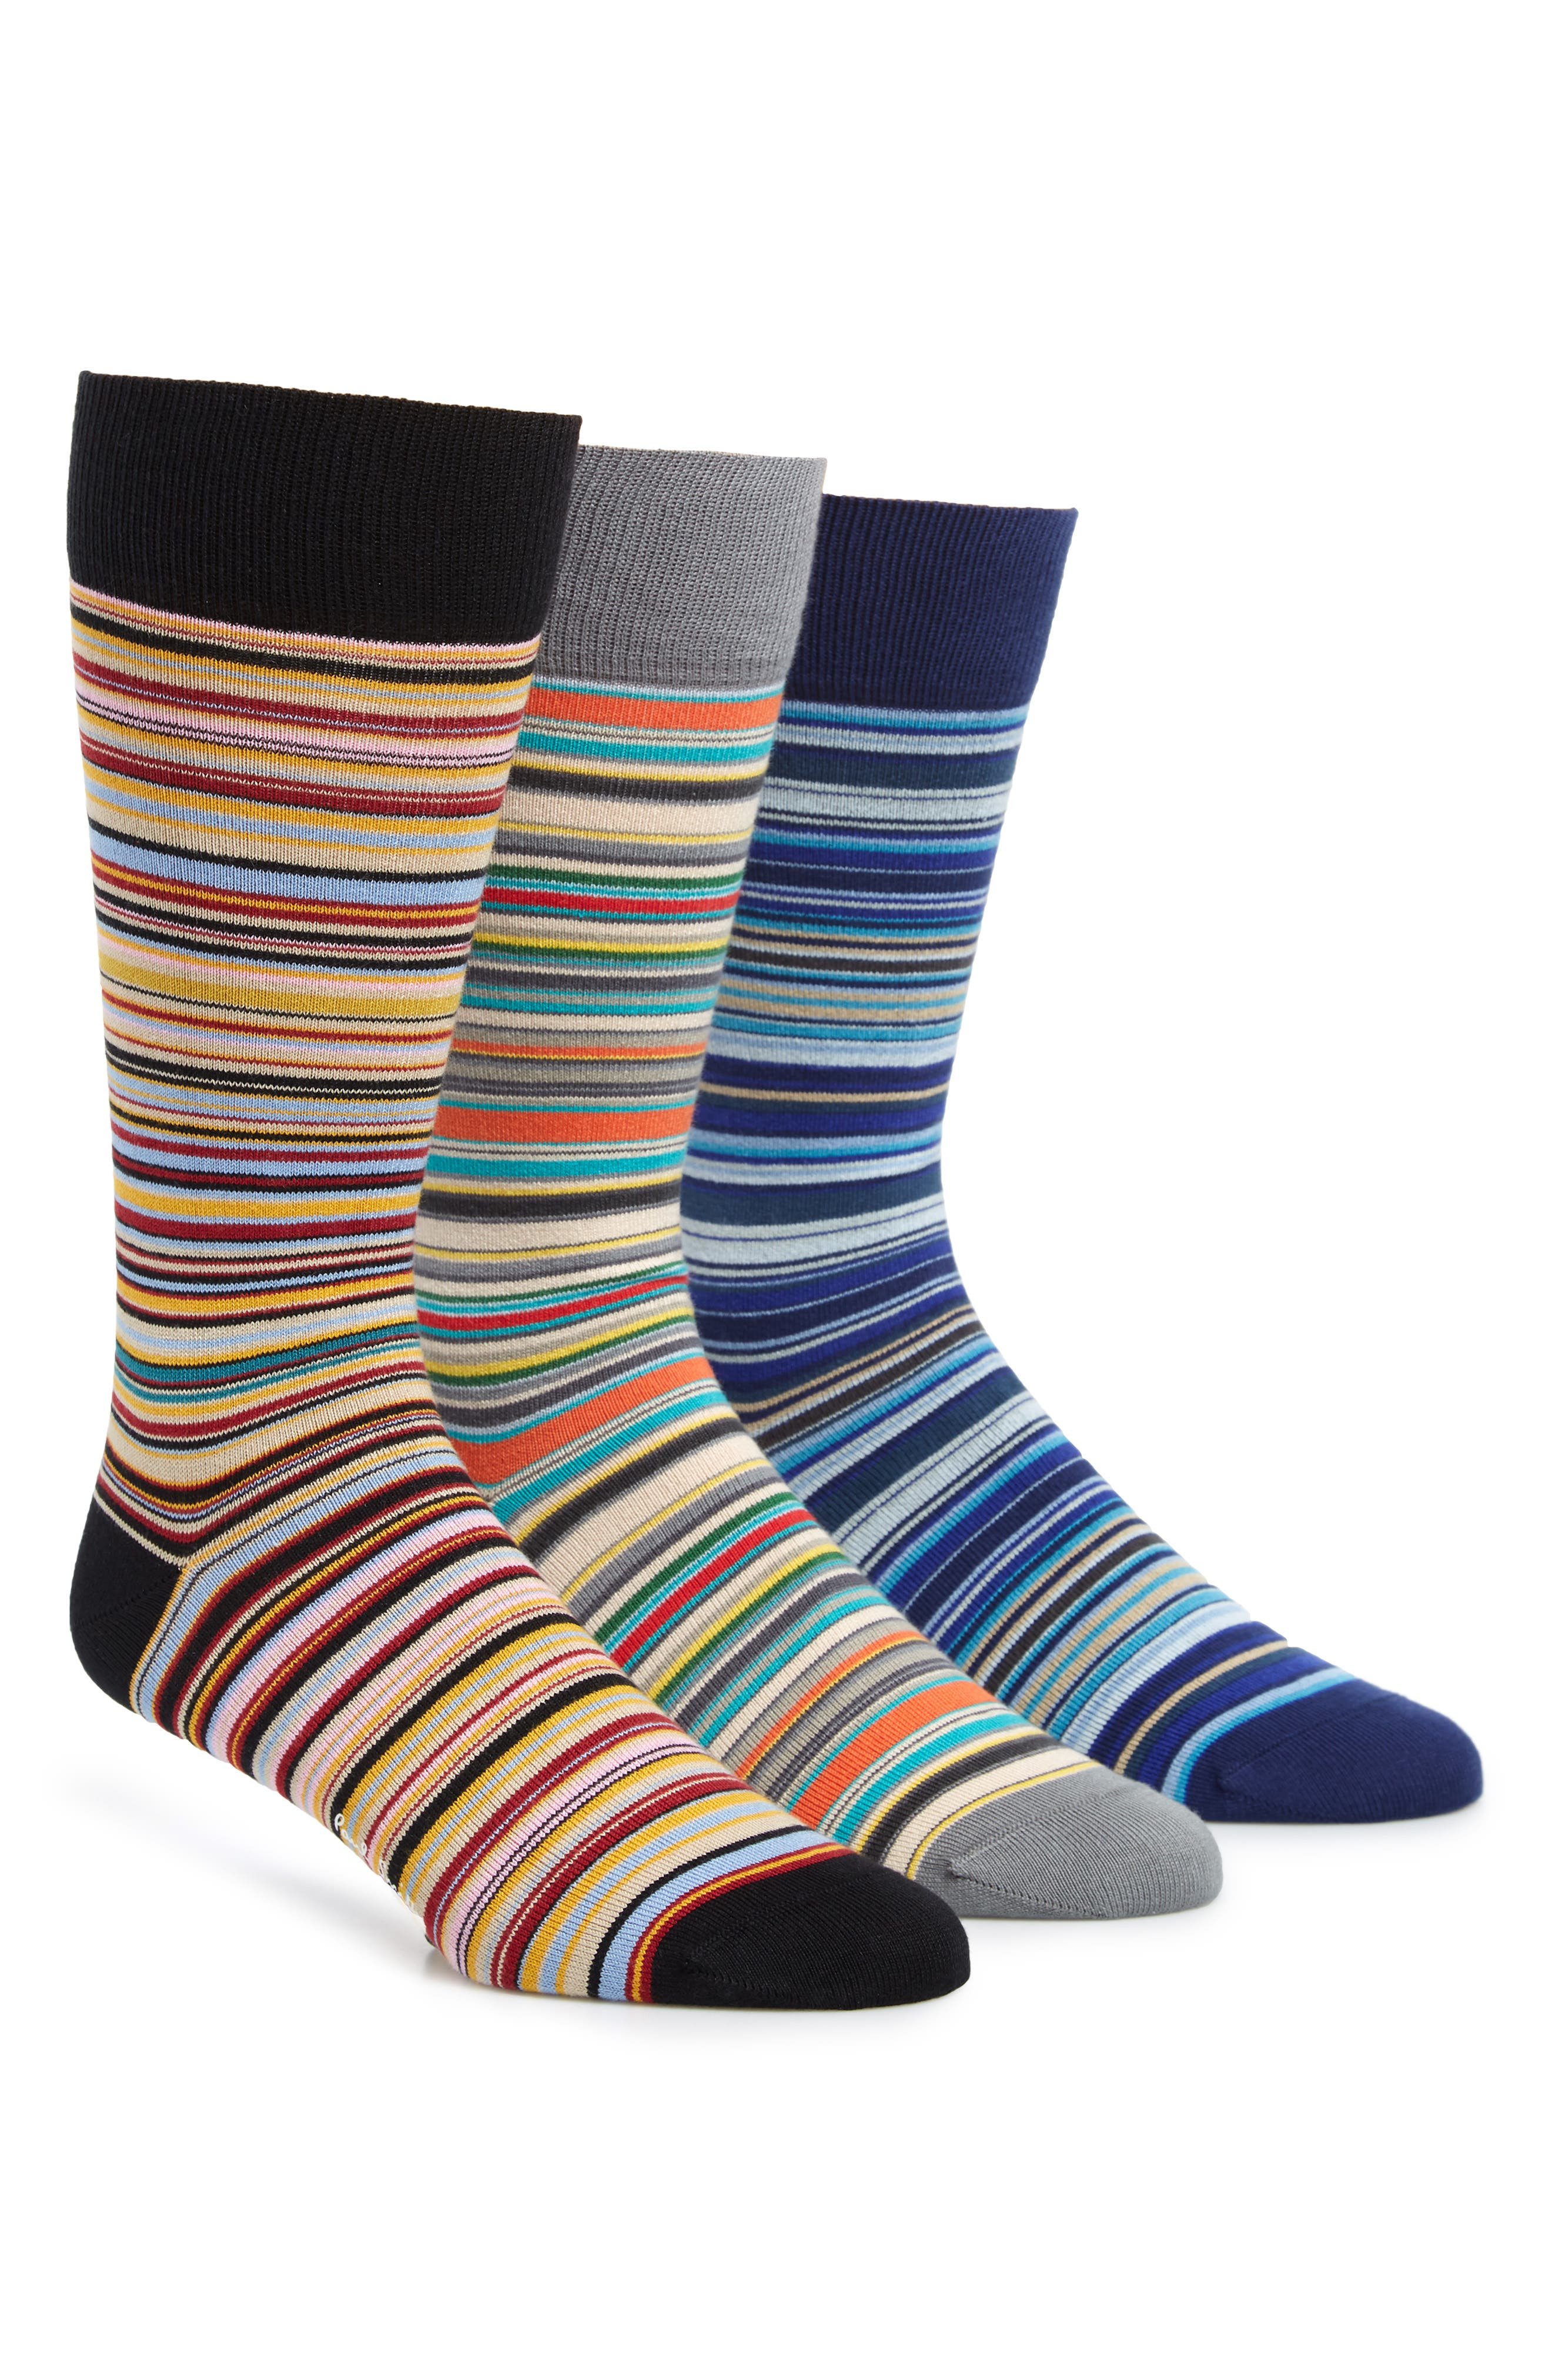 3-Pack Stripe Socks,                         Main,                         color, RED/ BLUE MULTI